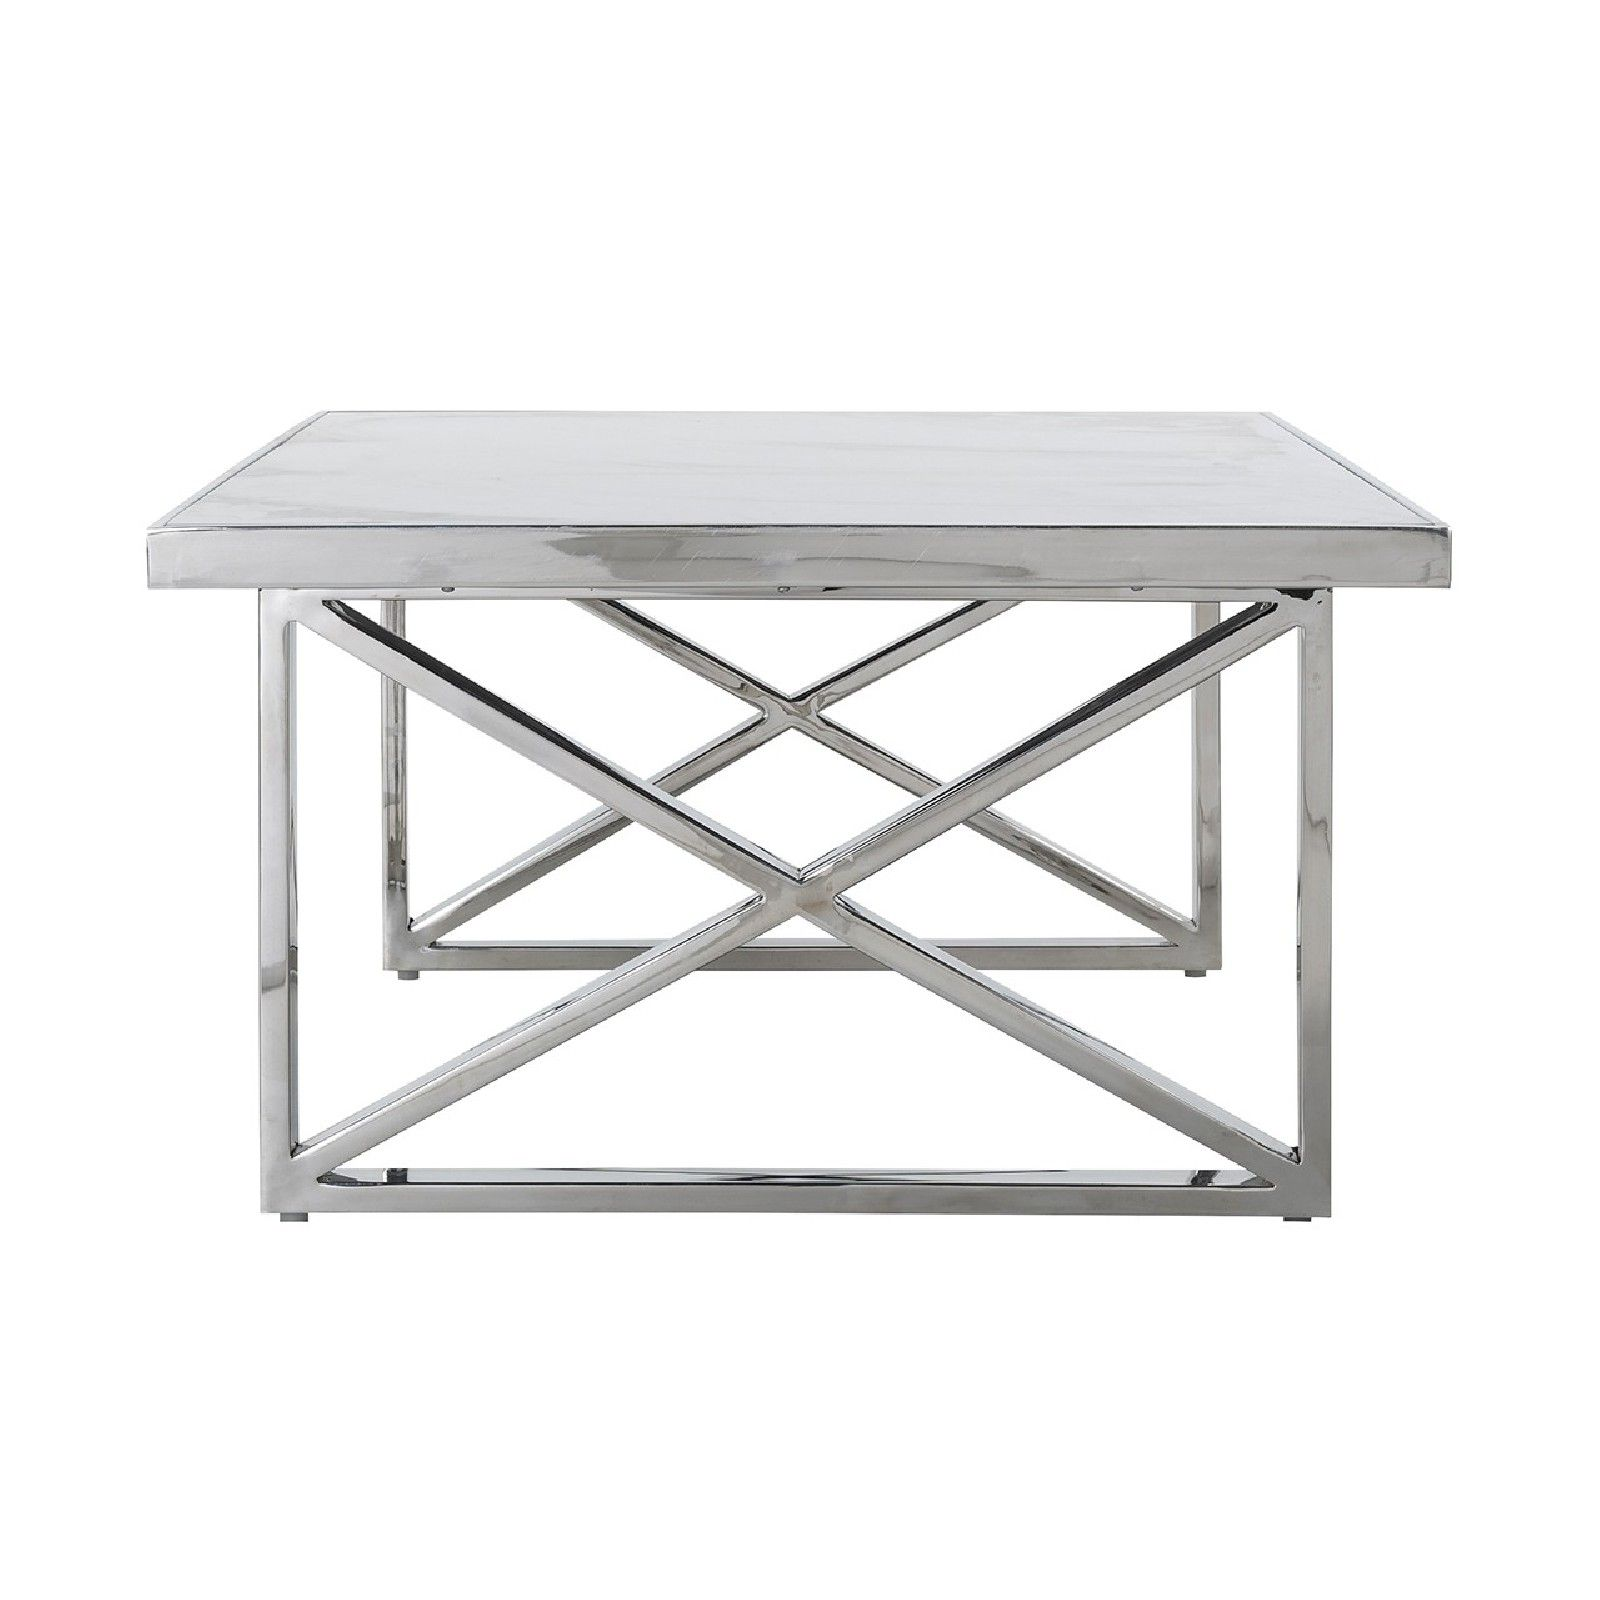 Table basse rectangulaire - Inox et marbre blanc